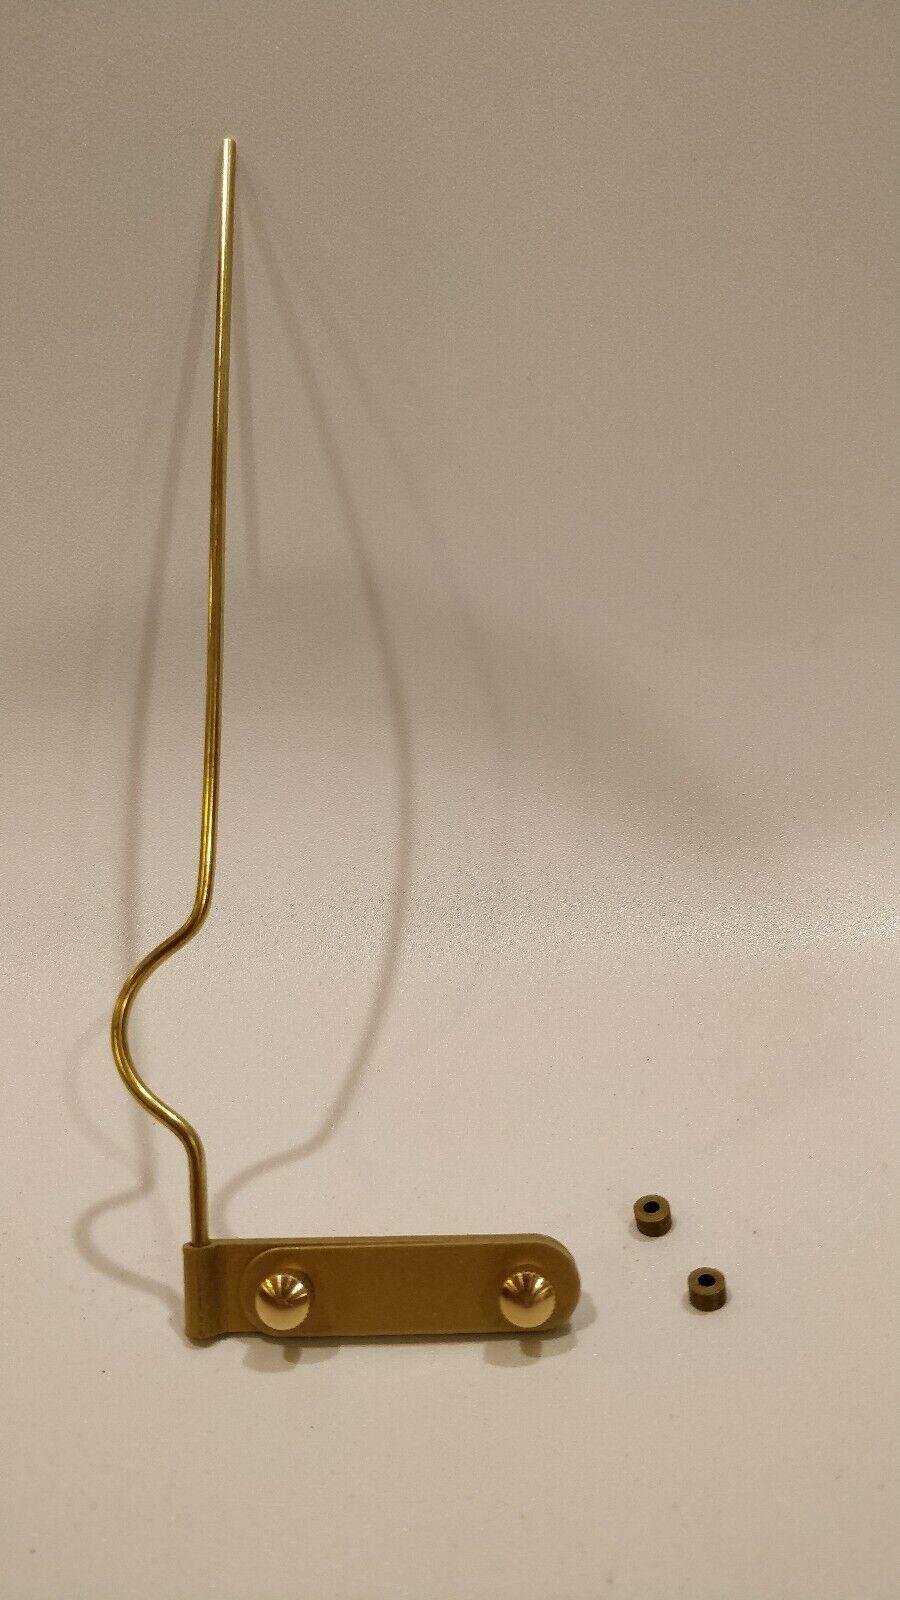 "DeArmond pickup /""monkey on a stick/"" pressure mount reproduction gold color"